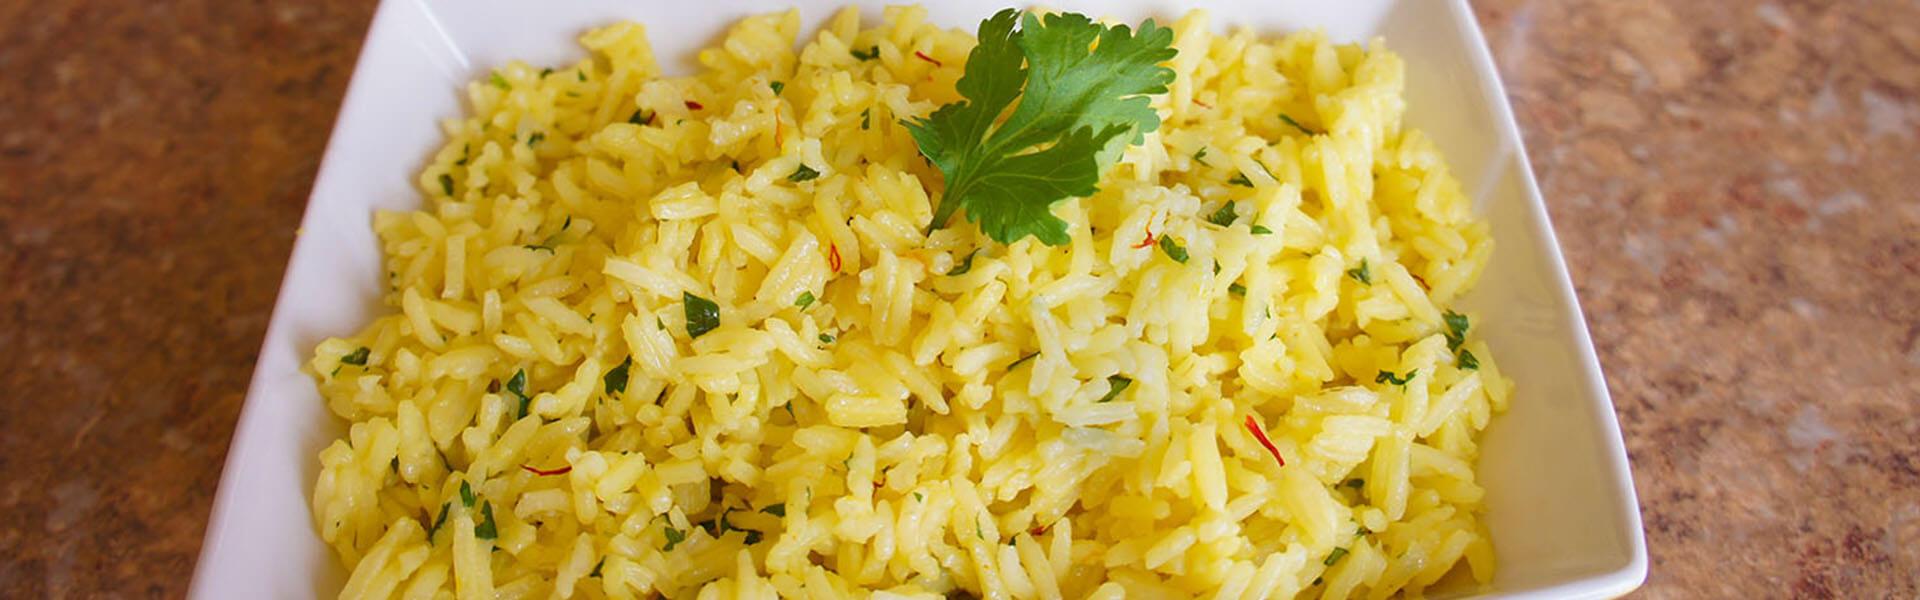 Lime and Saffron Basmati Rice